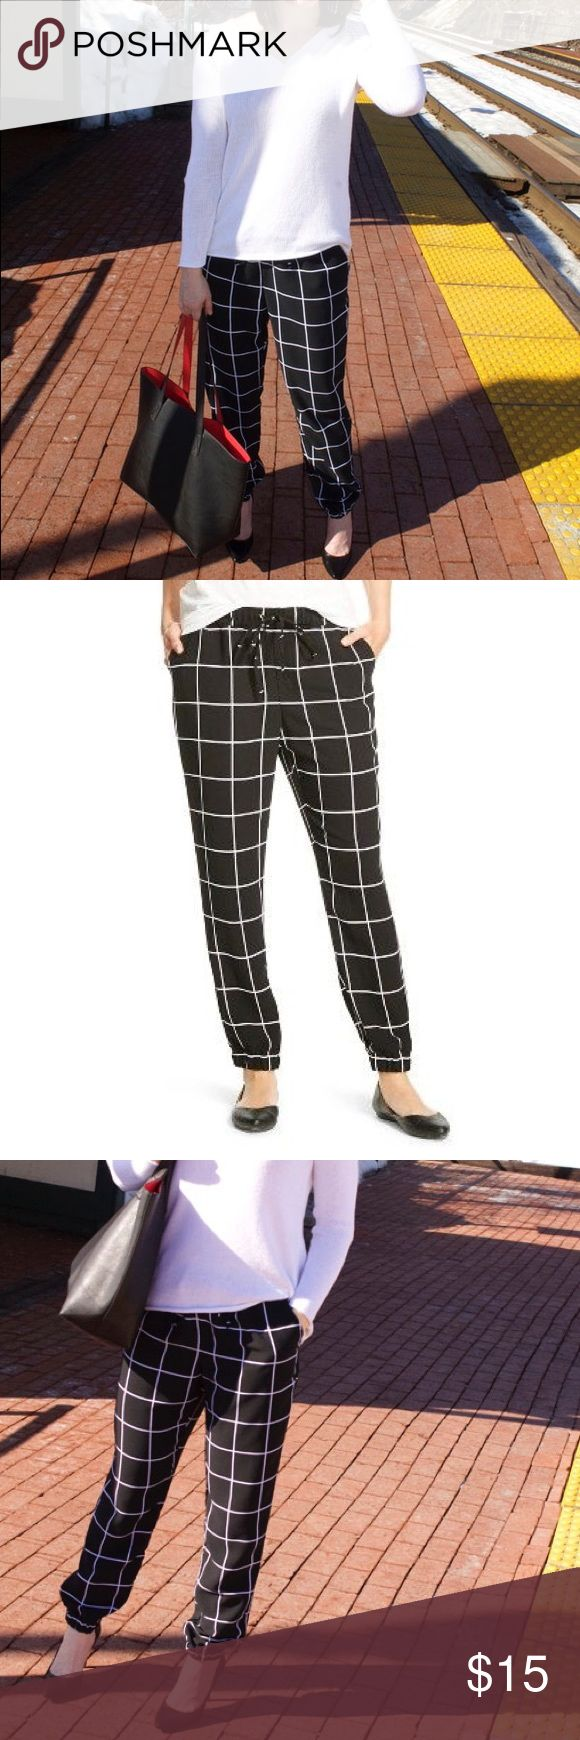 Black and white jogger pants Size medium windowpane joggers. Pants